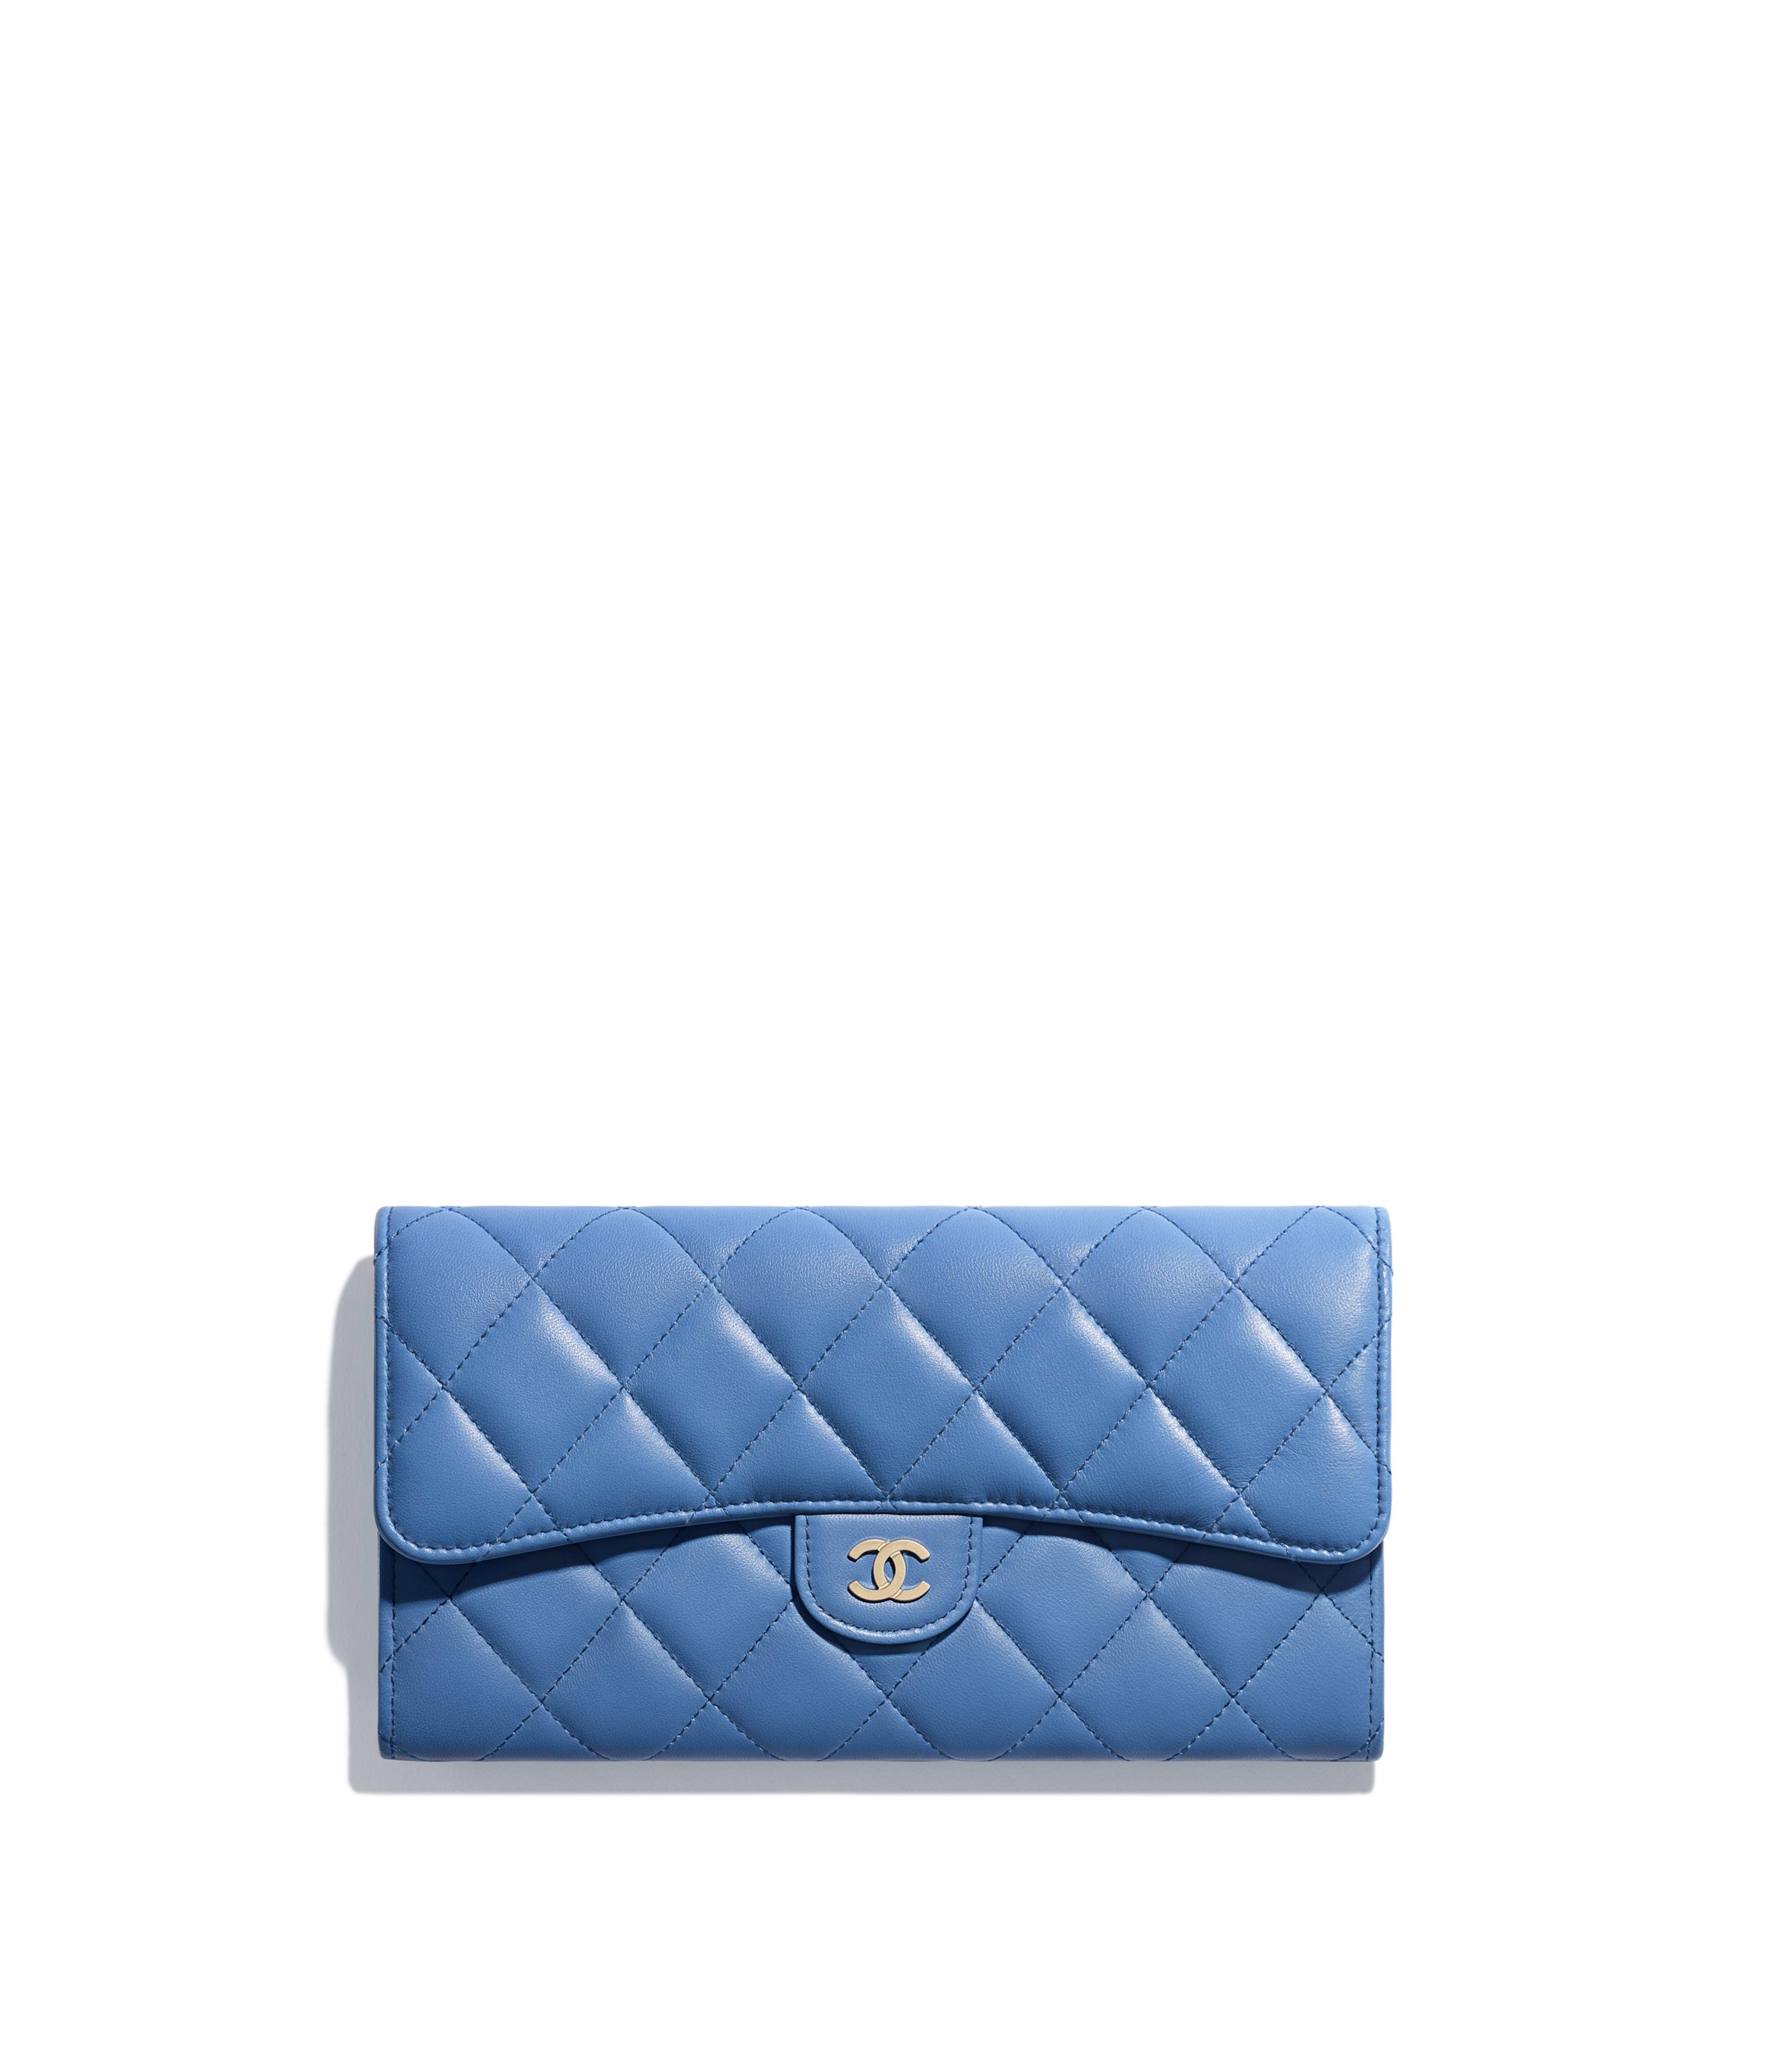 0a0630b8a808 Classic Long Flap Wallet Lambskin & Gold-Tone Metal, Blue Ref.  A80758Y07659N0902